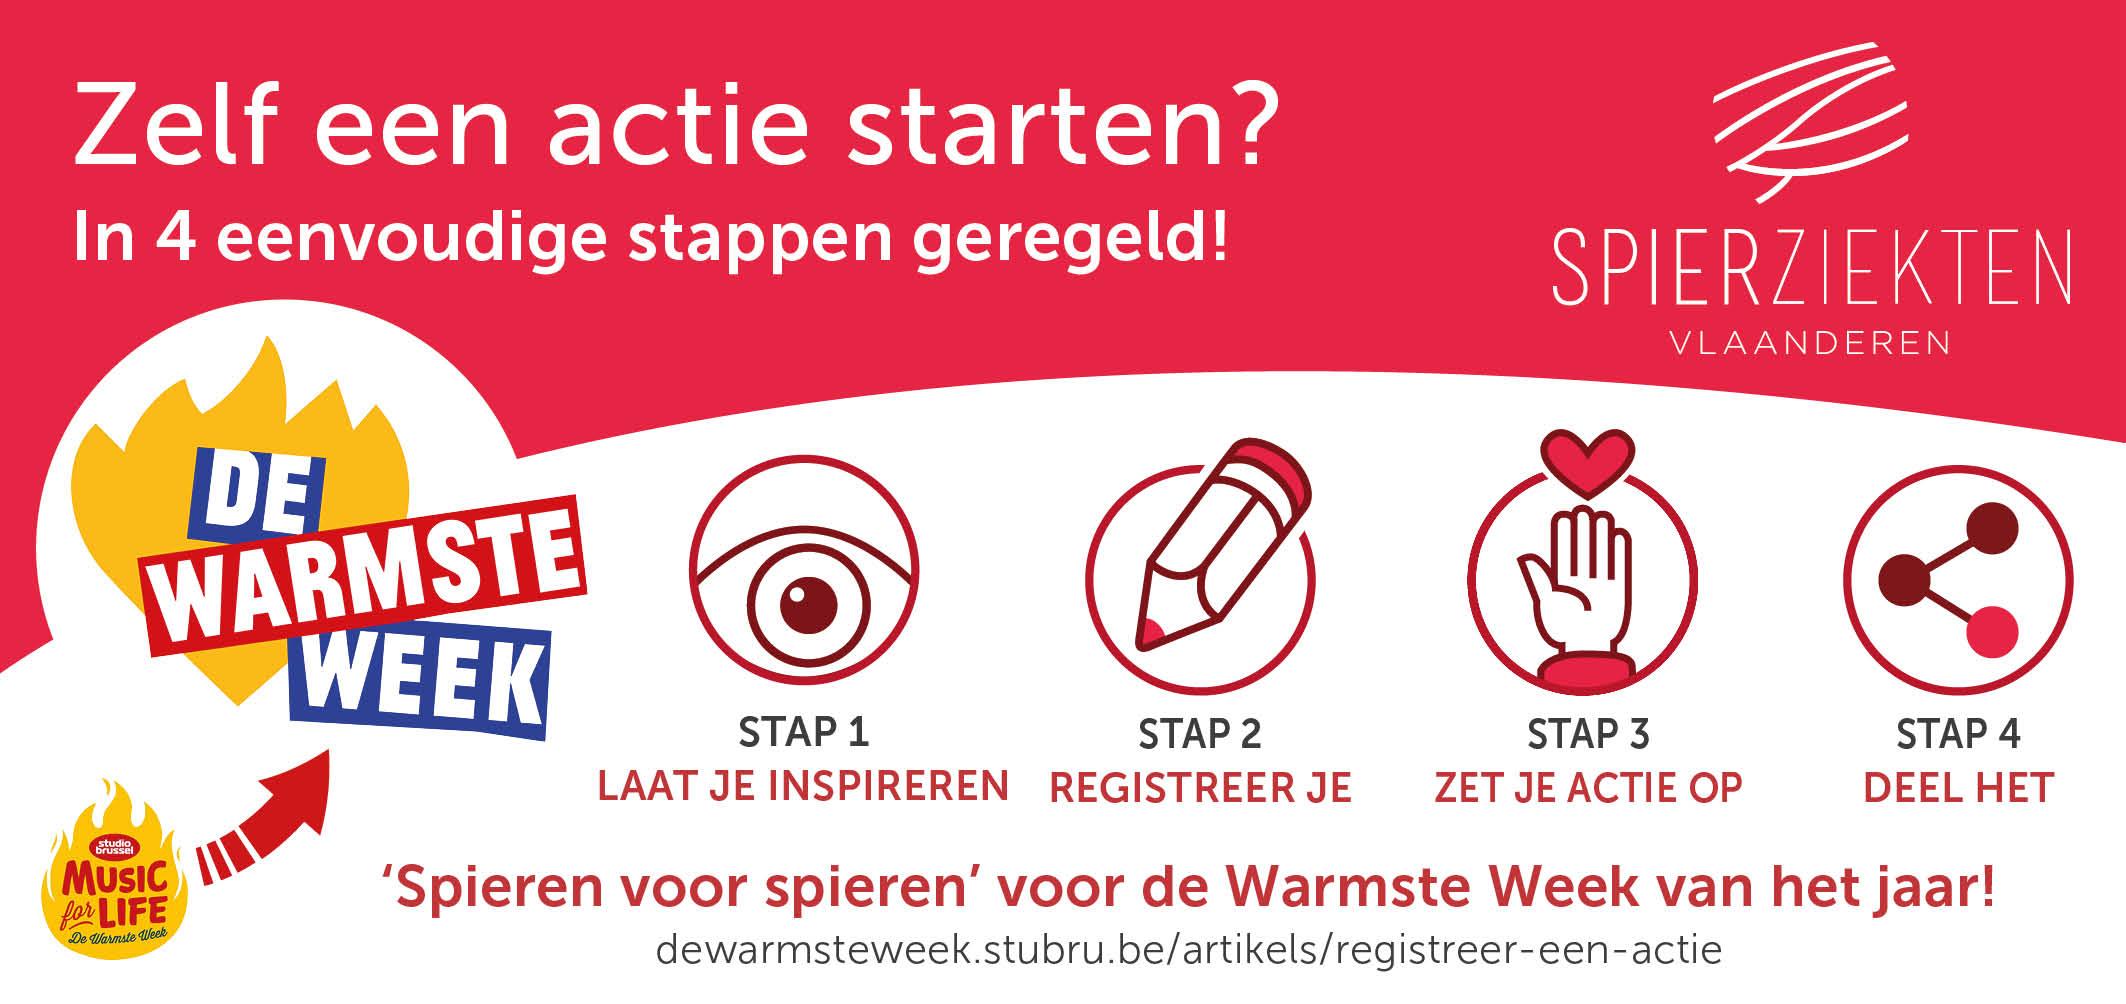 Actie-organiseren-Music-for-Life-4-stappen_Spierziekten-Vlaanderen2019 Music for Life 2019